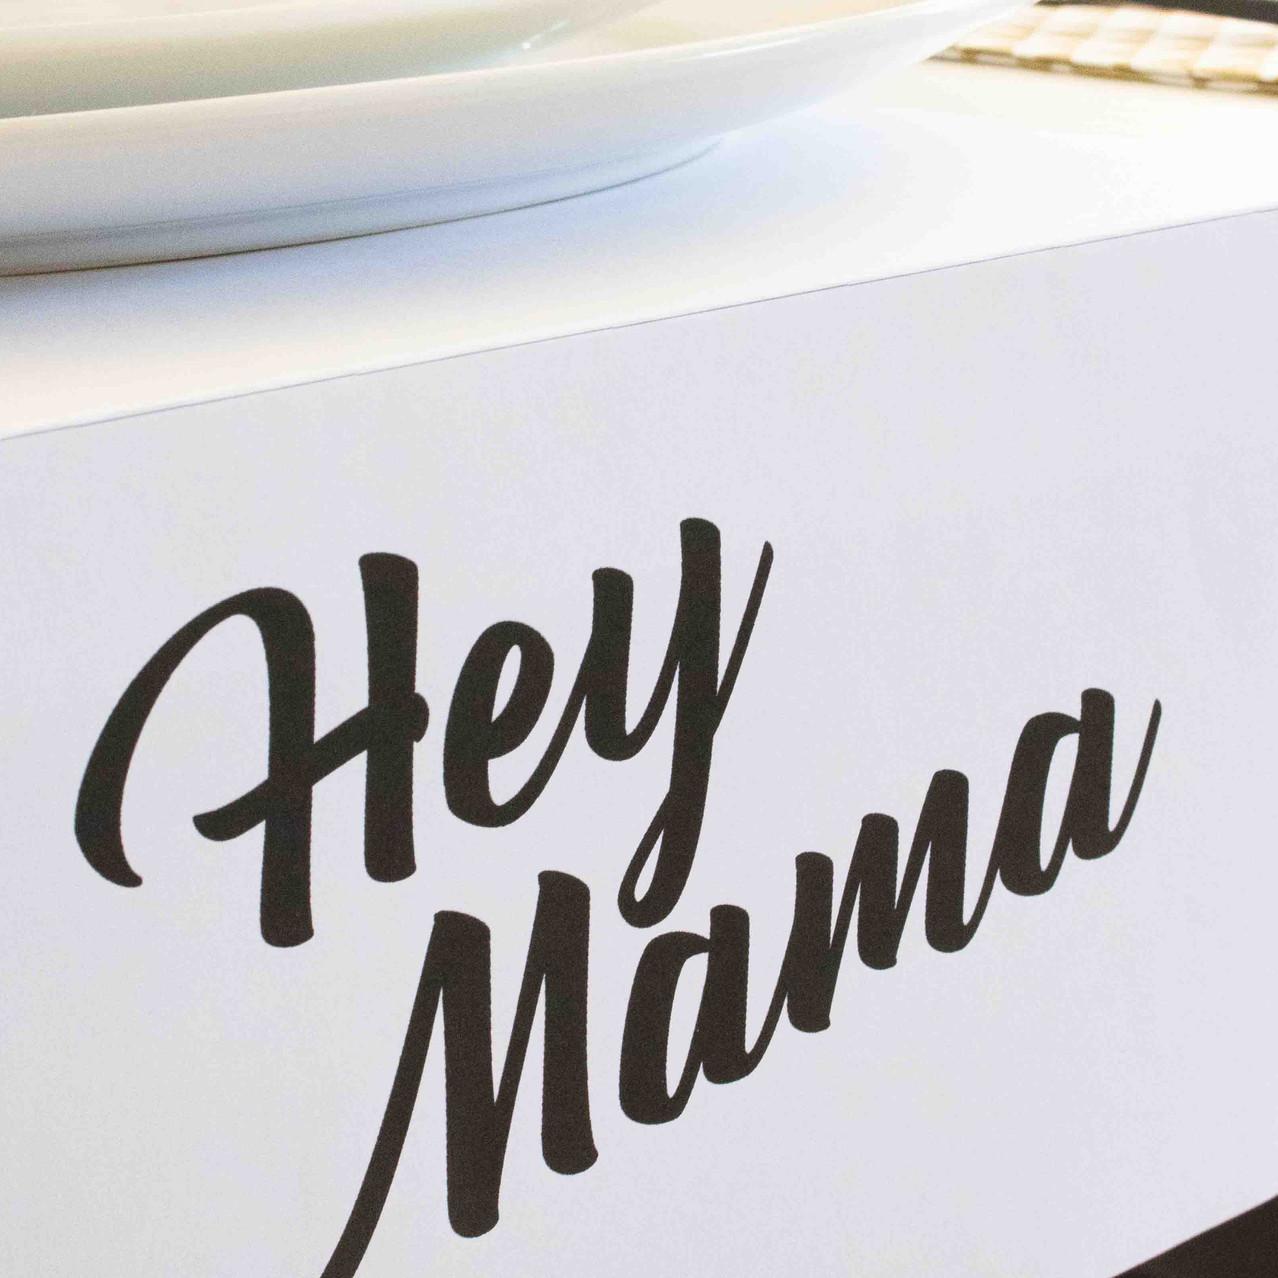 Muttertag 2019, Muttertag, Muttertagsidee, Freebies, Printables, Hey Mama, Mama